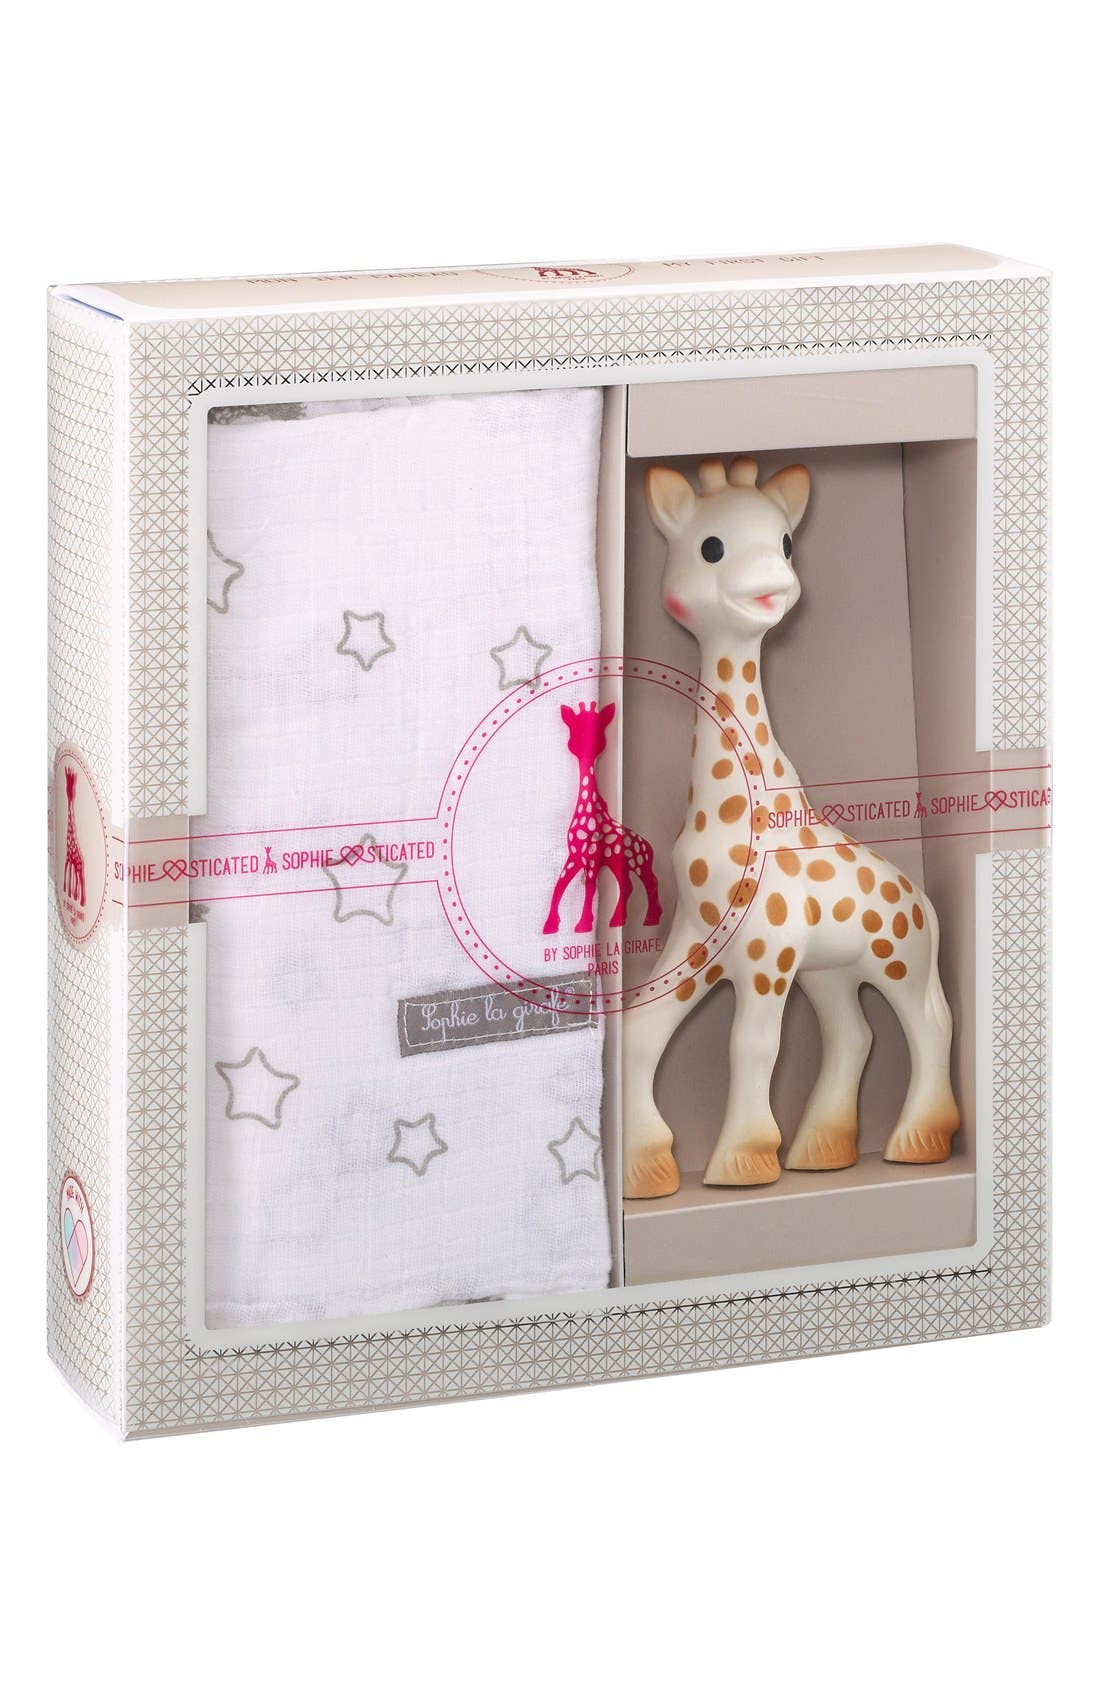 Alternate Image 1 Selected - Sophie la Girafe 'Sophiesticated' Swaddling Cloth & Teething Toy